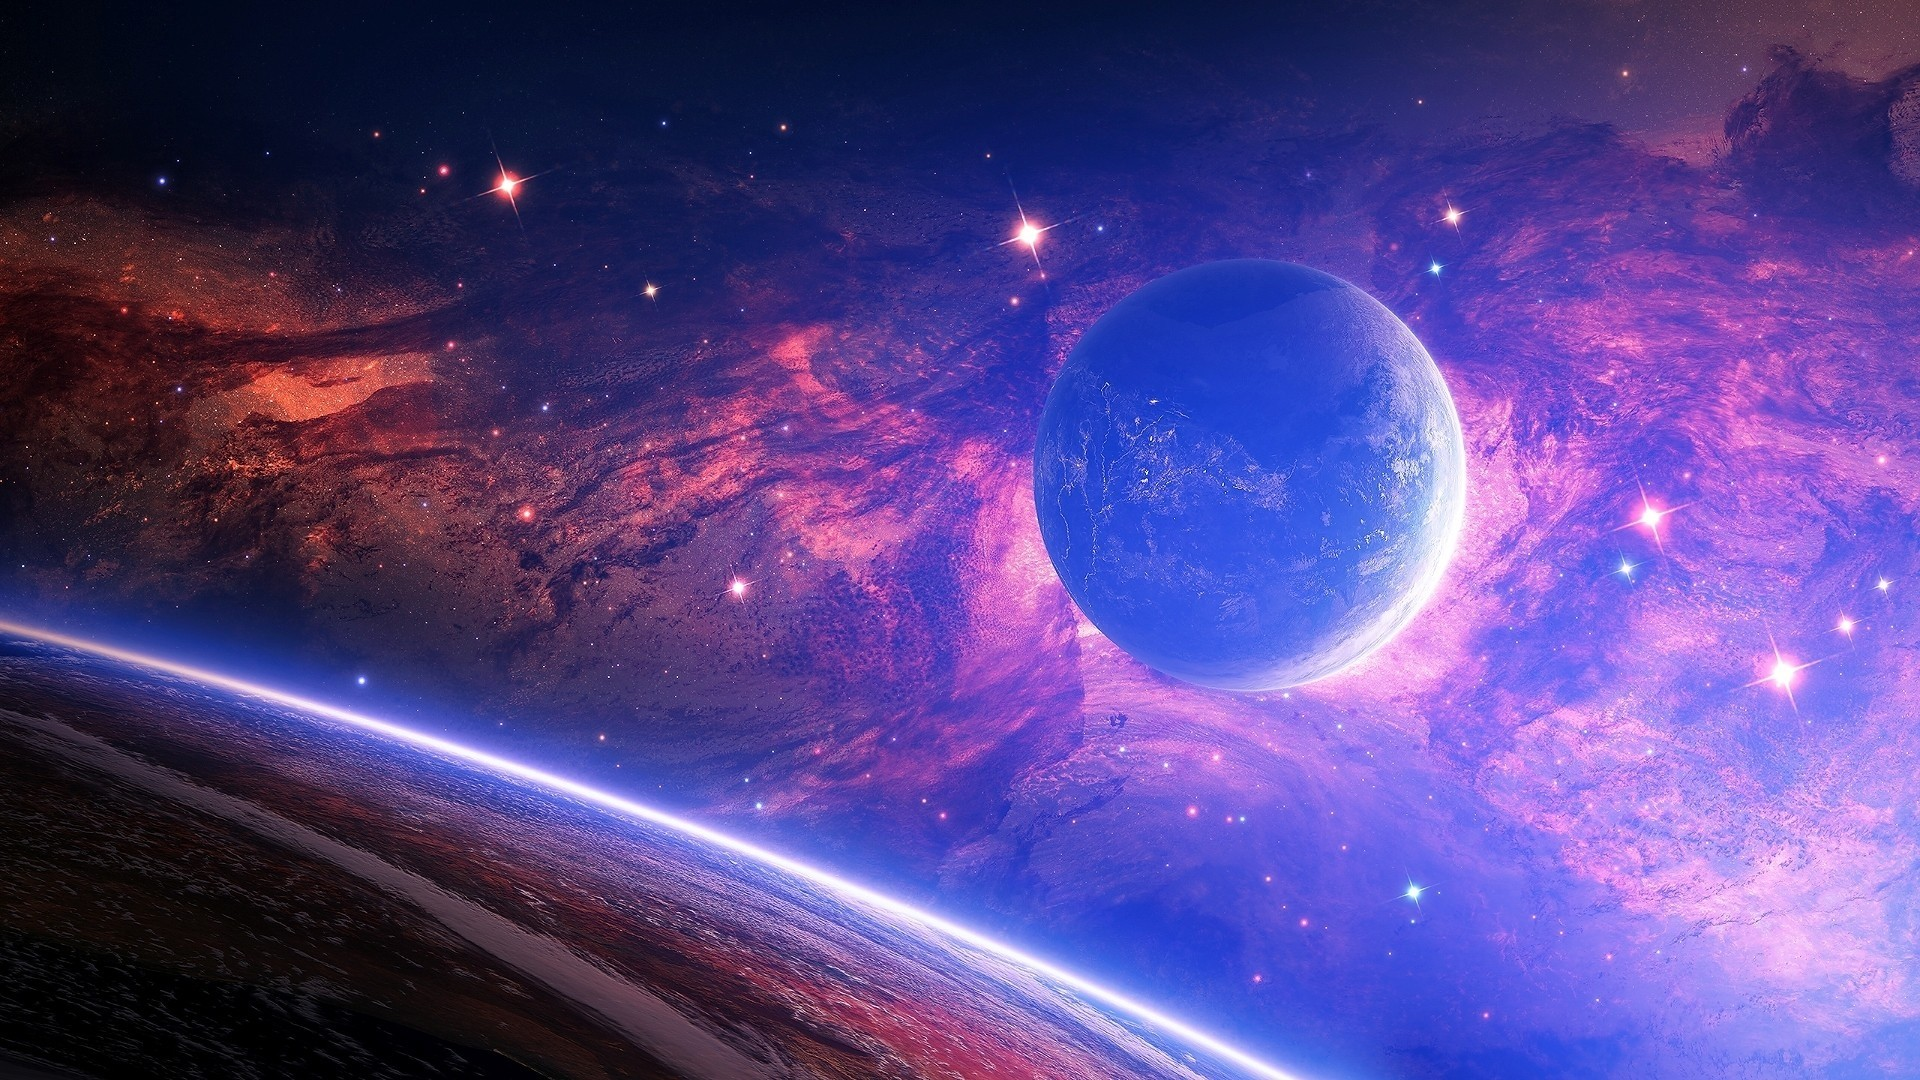 1920x1080 Preview Wallpaper Planet Light Spots Space